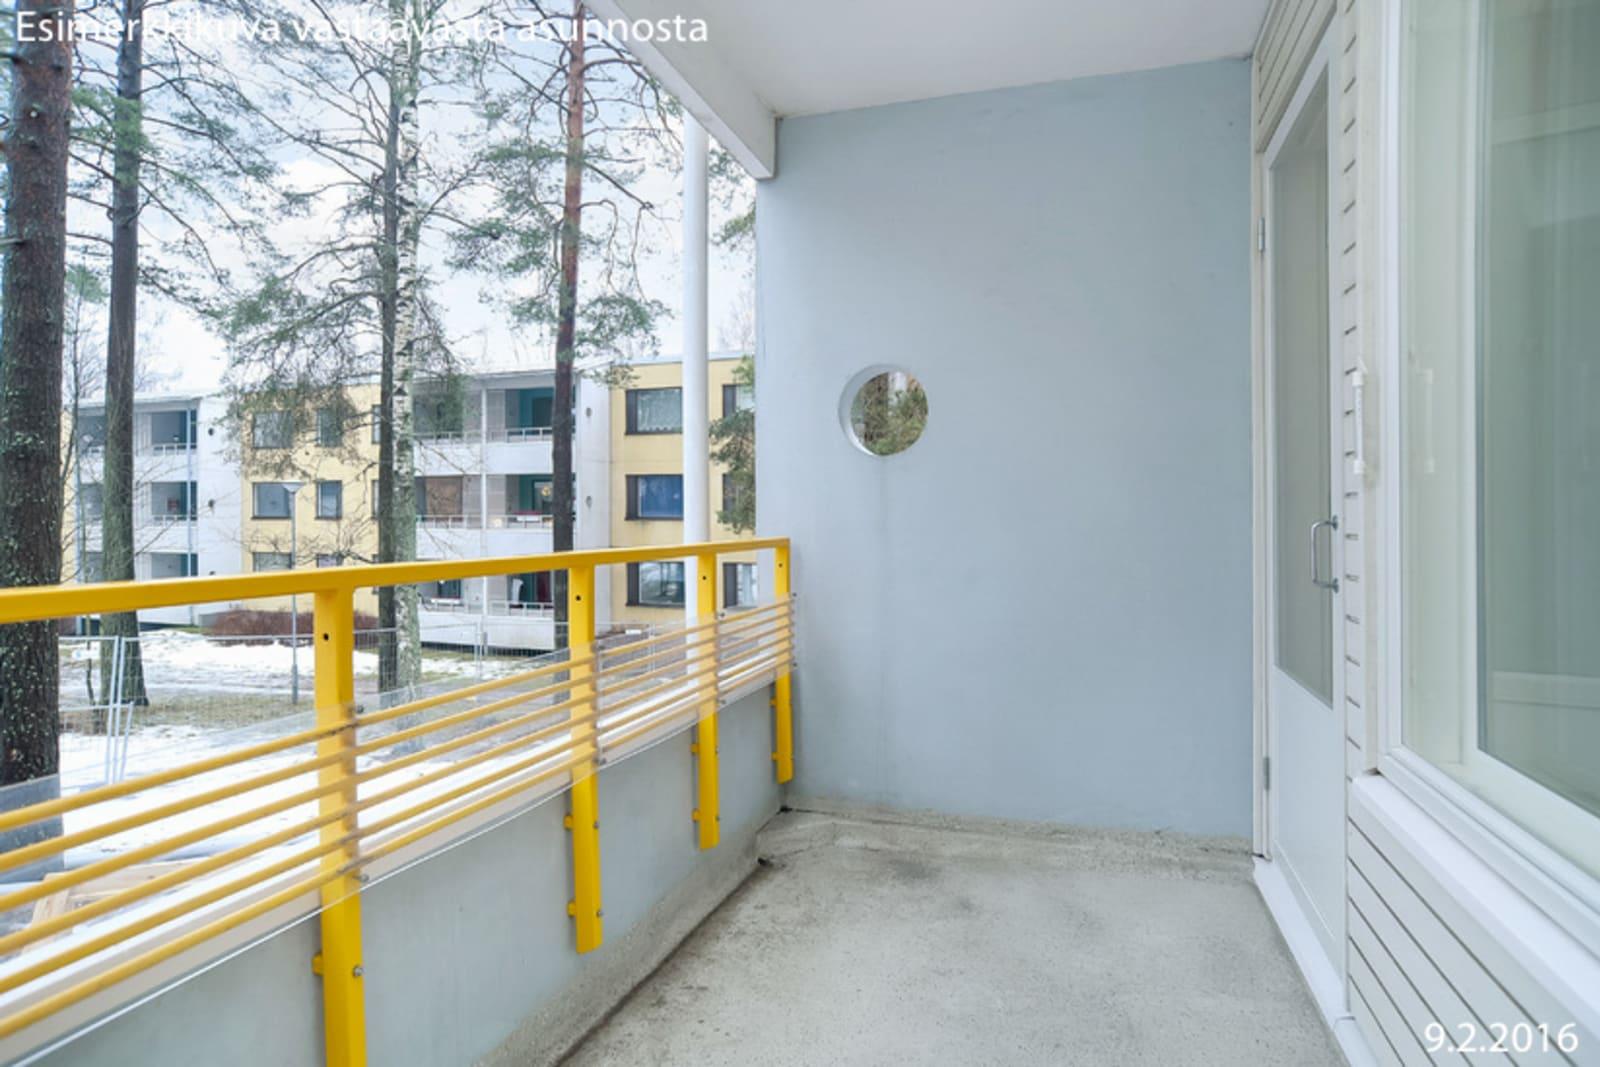 Espoo, Laajalahti, Heinjoenpolku 2 G-J H 060